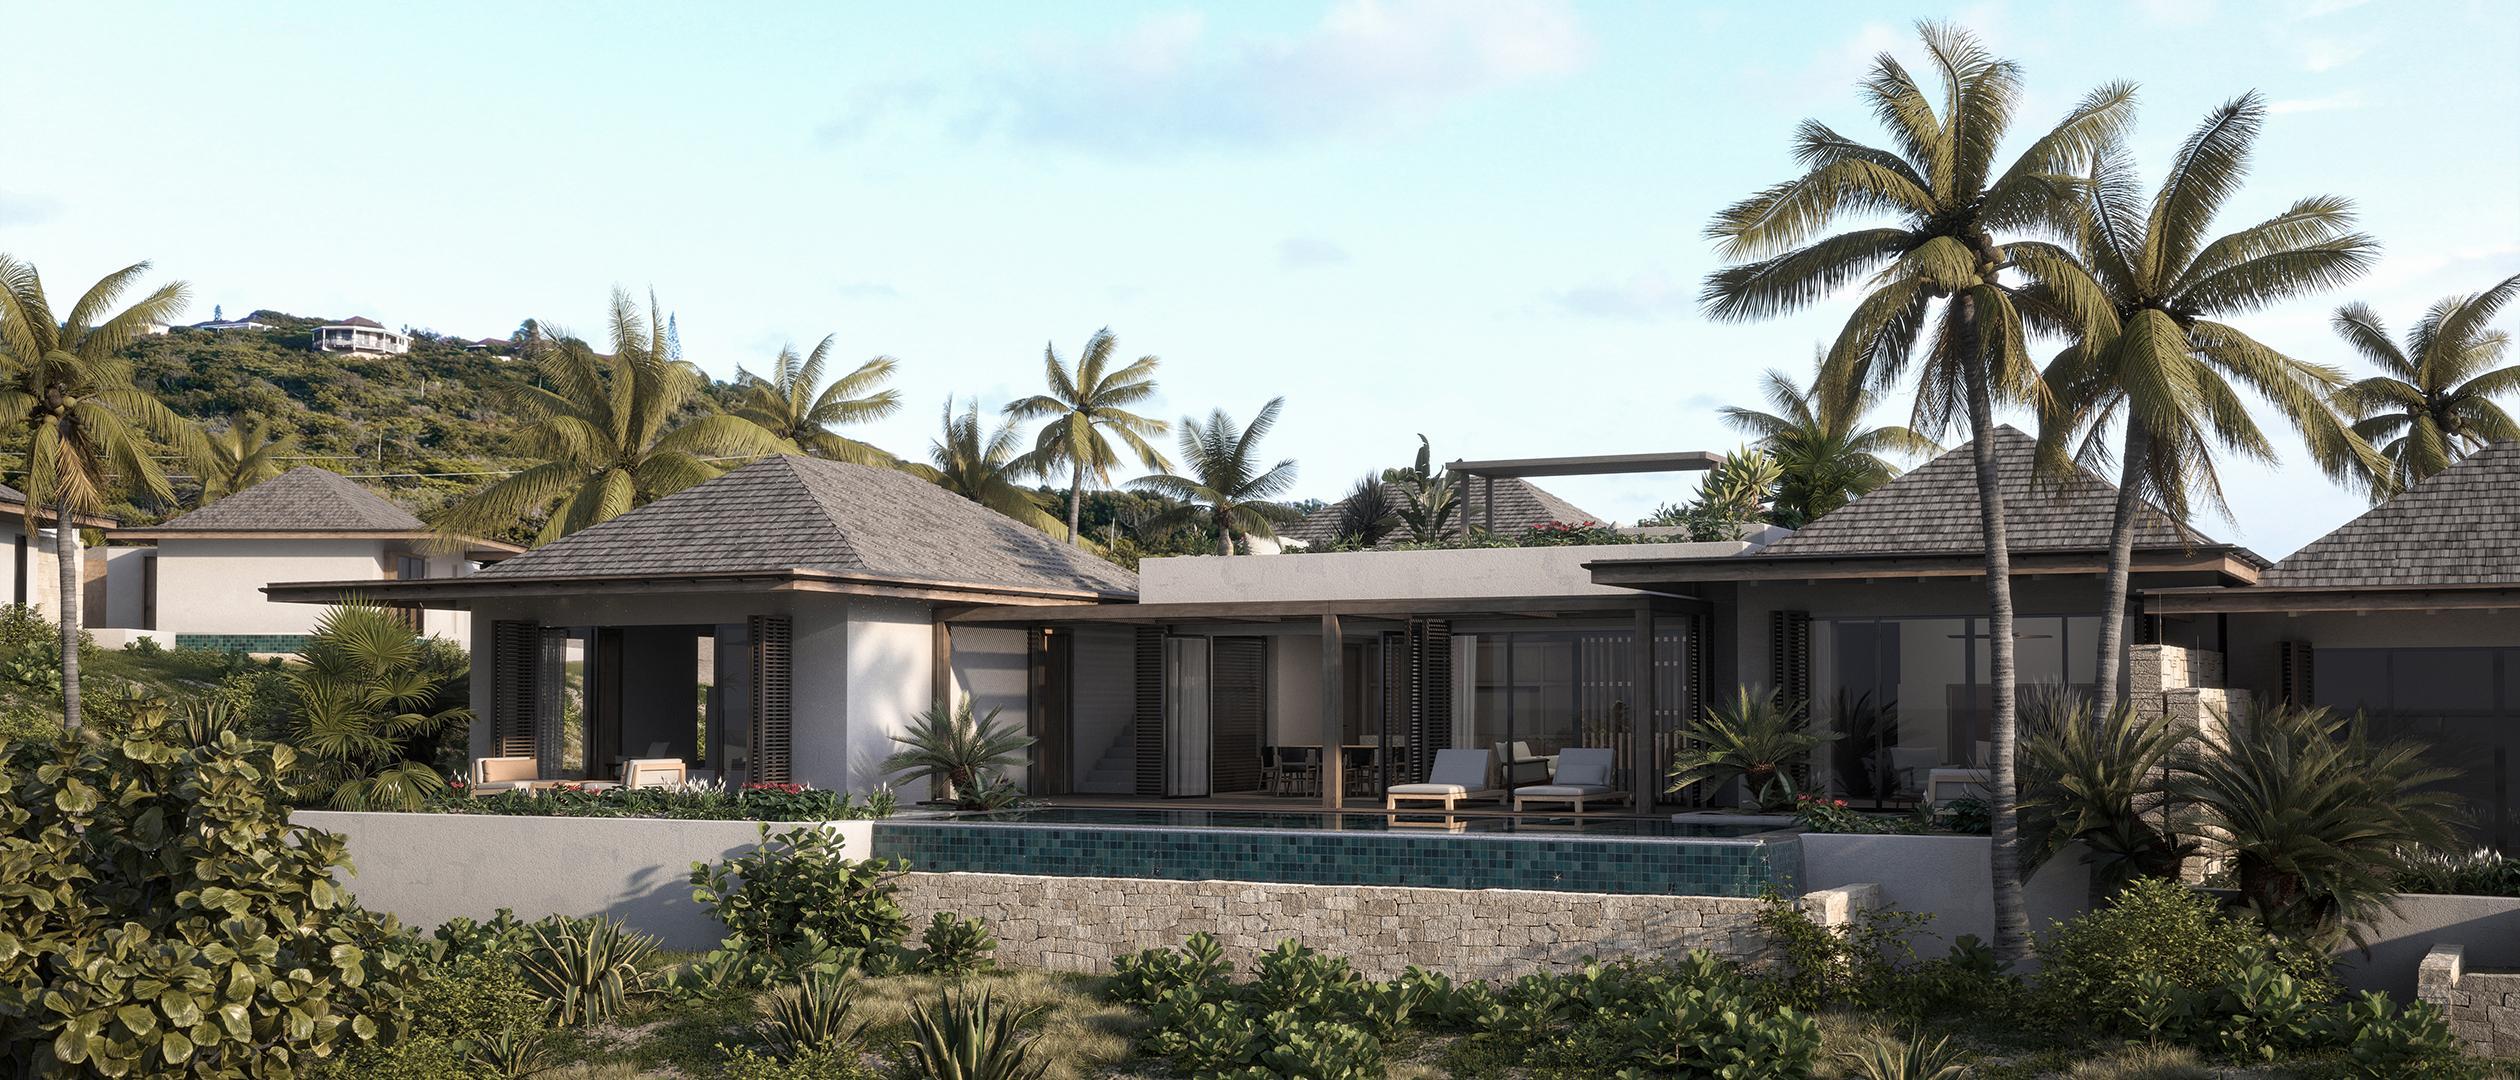 Half Moon Bay Antigua Rosewood Hotel & Resort